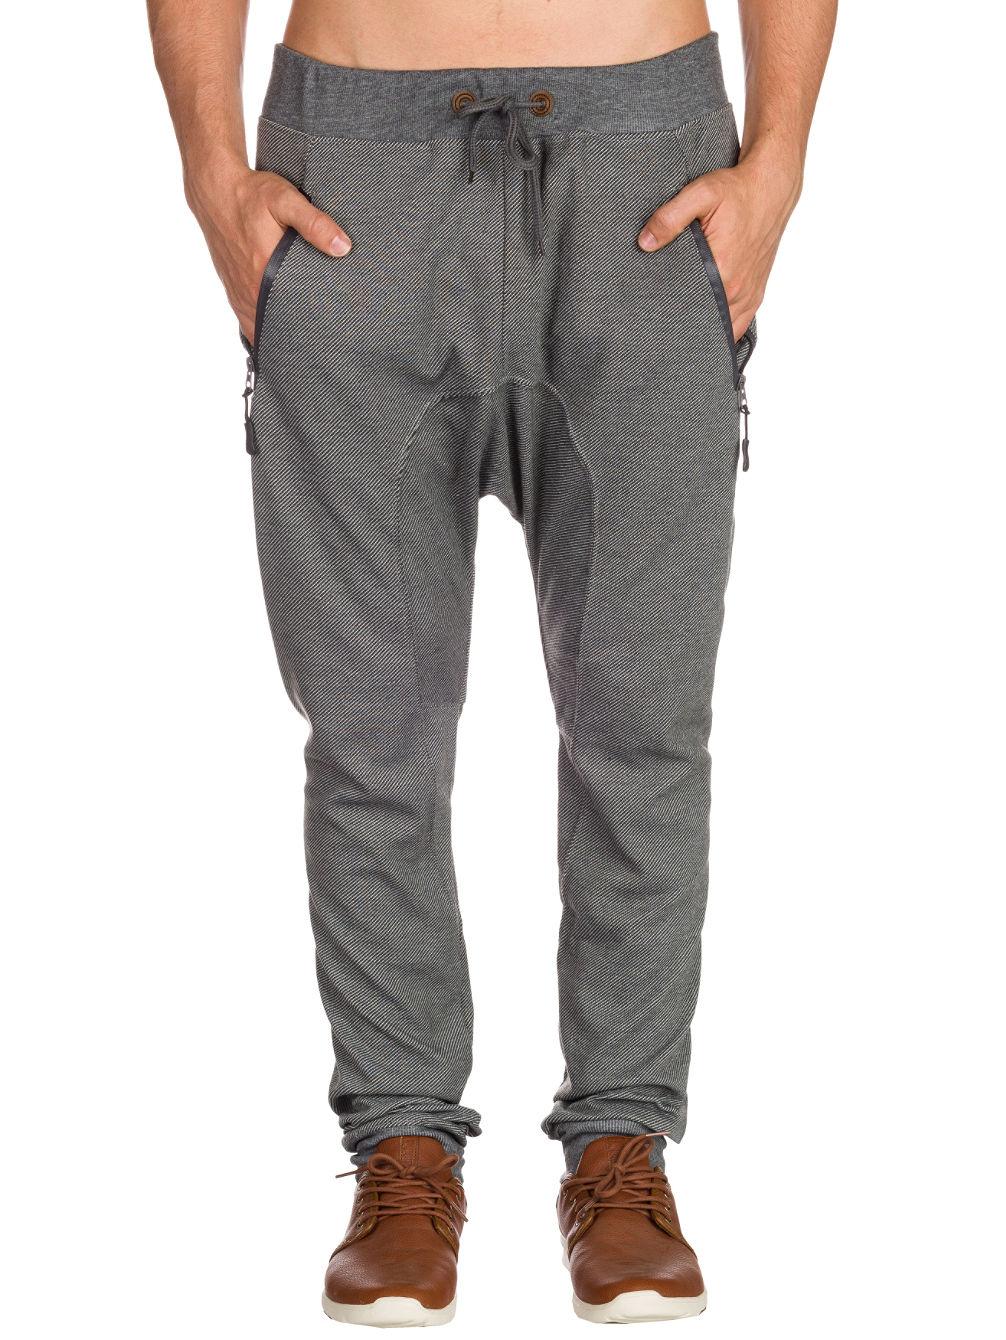 american-stitch-fall-pique-jogging-pants